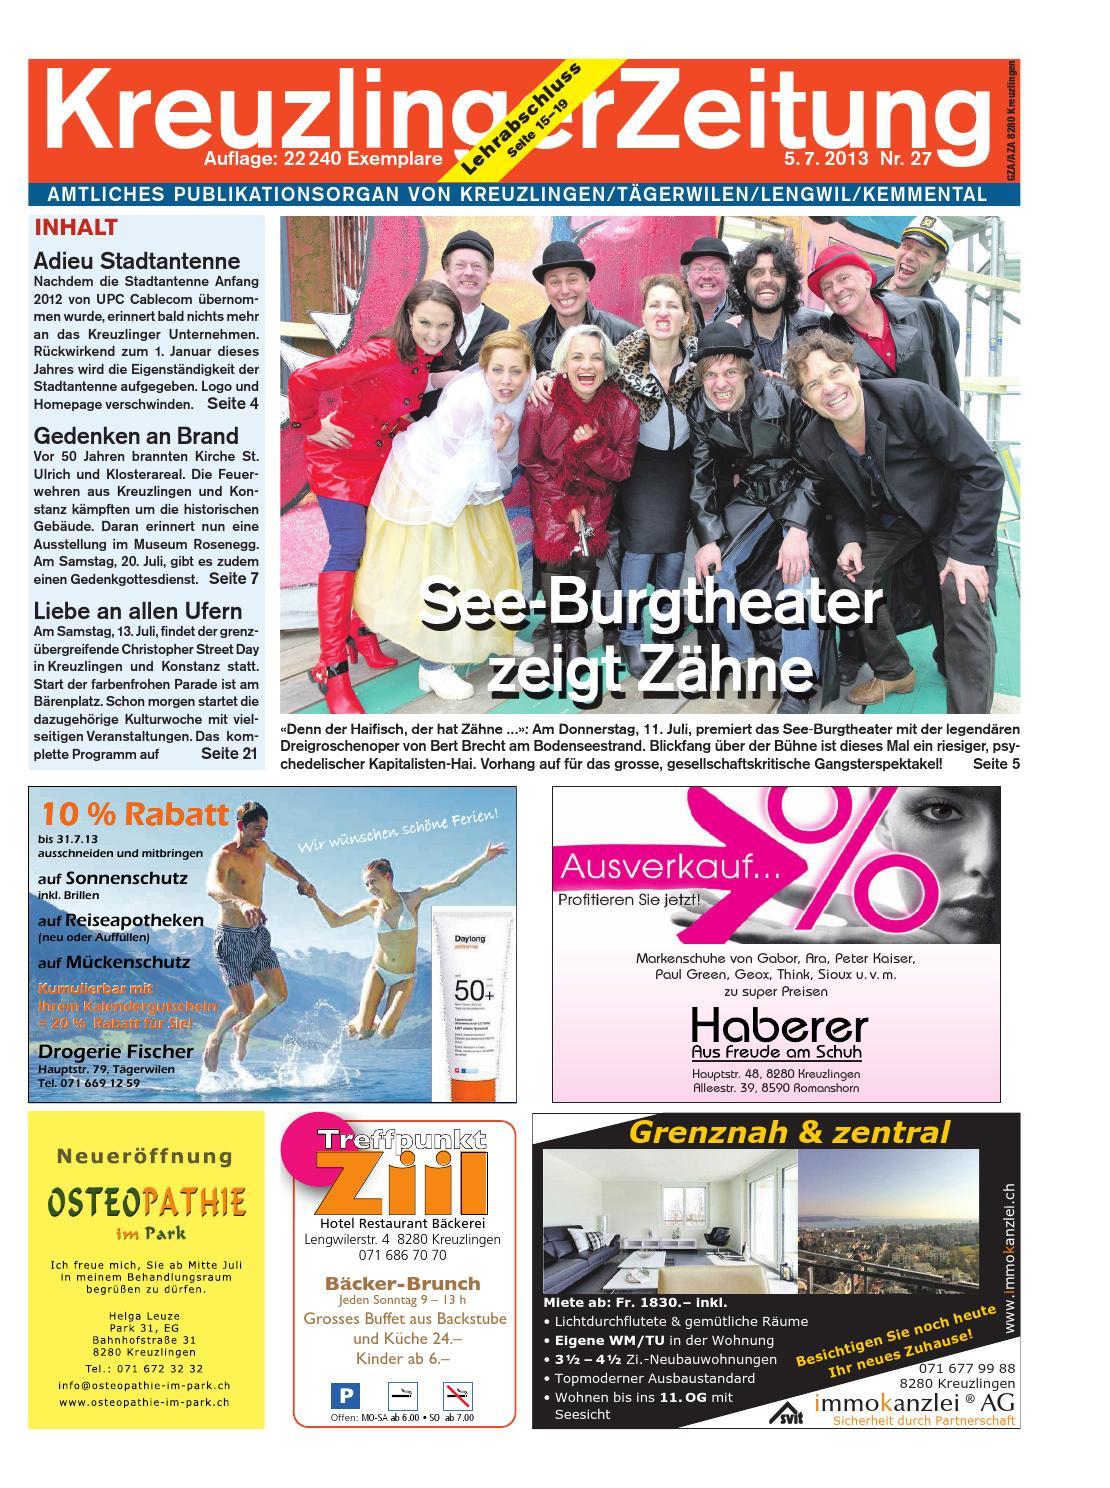 Klz 27 by KreuzlingerZeitung - issuu